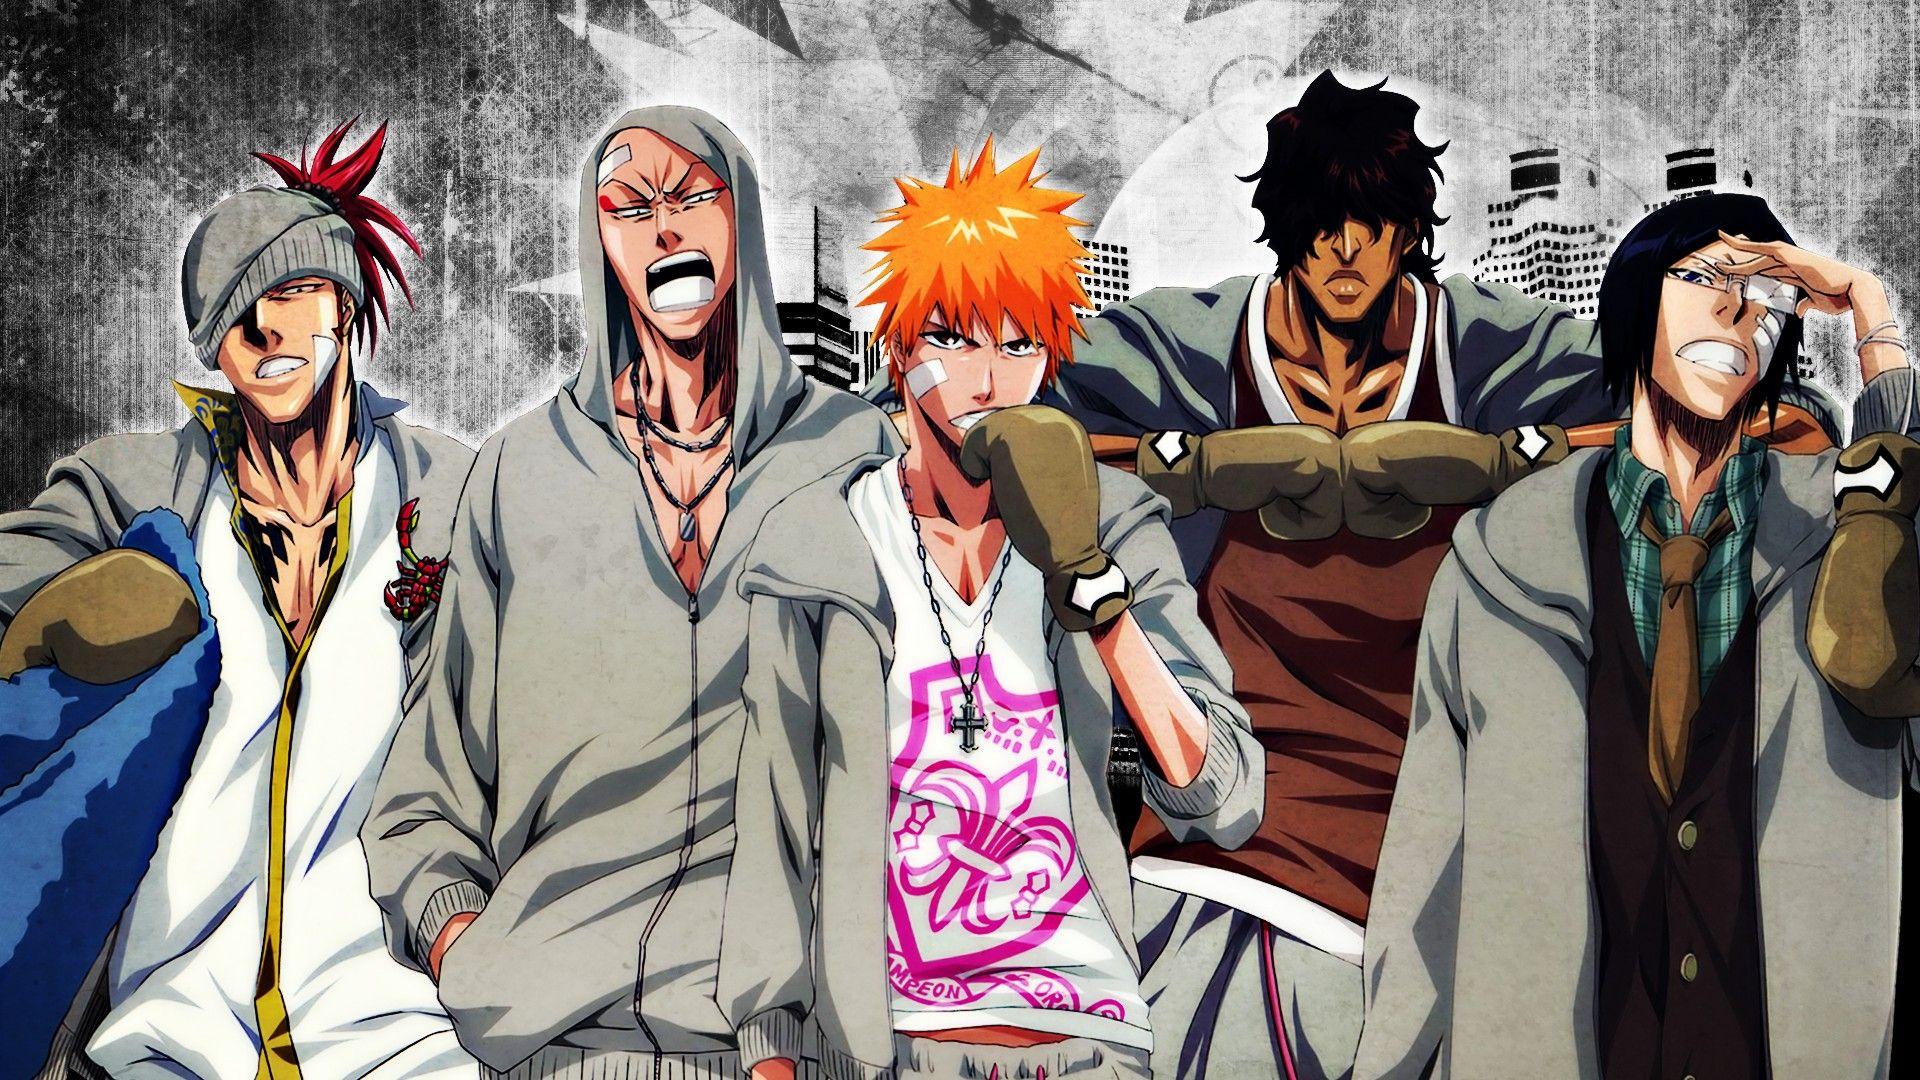 Anime &- Manga 4 All: Bleach Anime Wallpapers